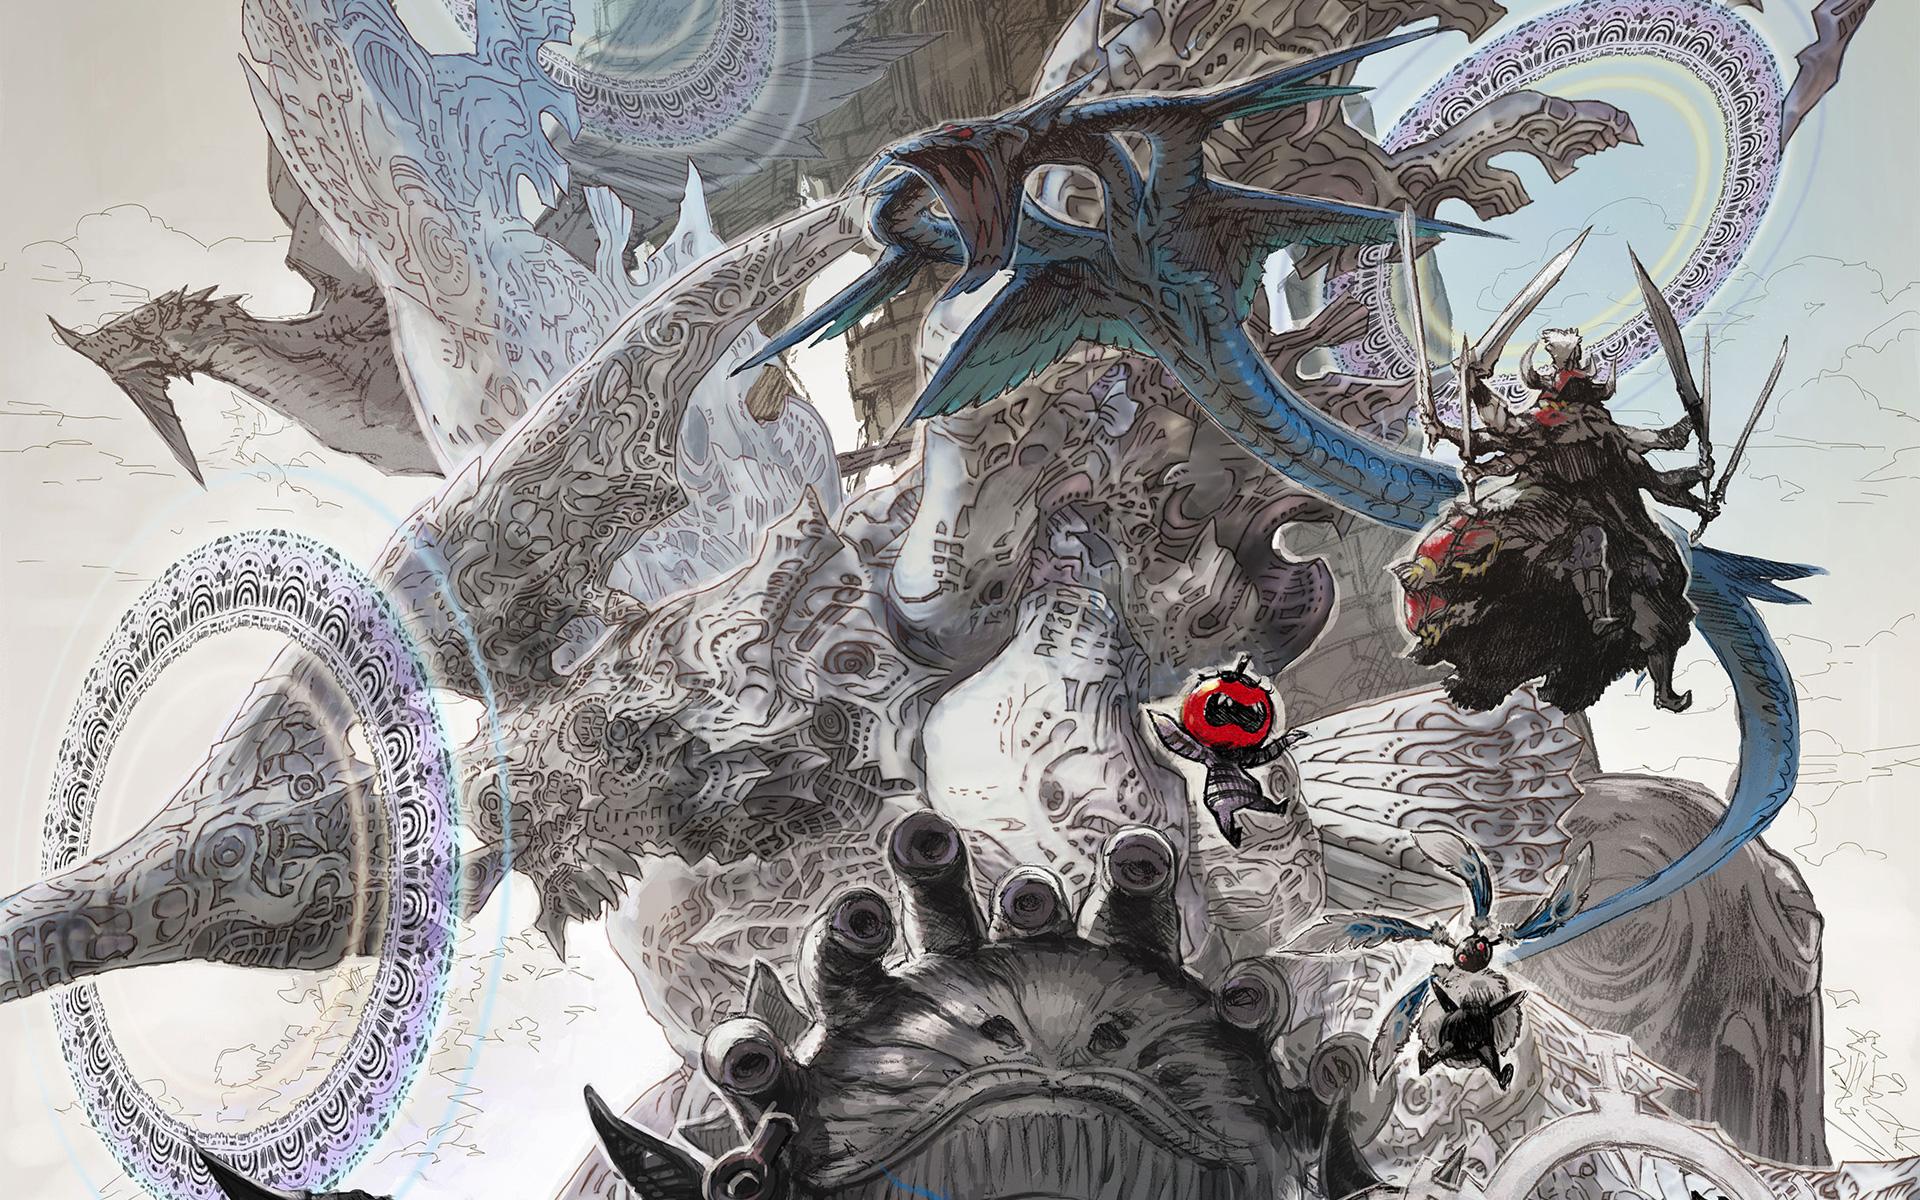 Free Final Fantasy XII Wallpaper in 1920x1200